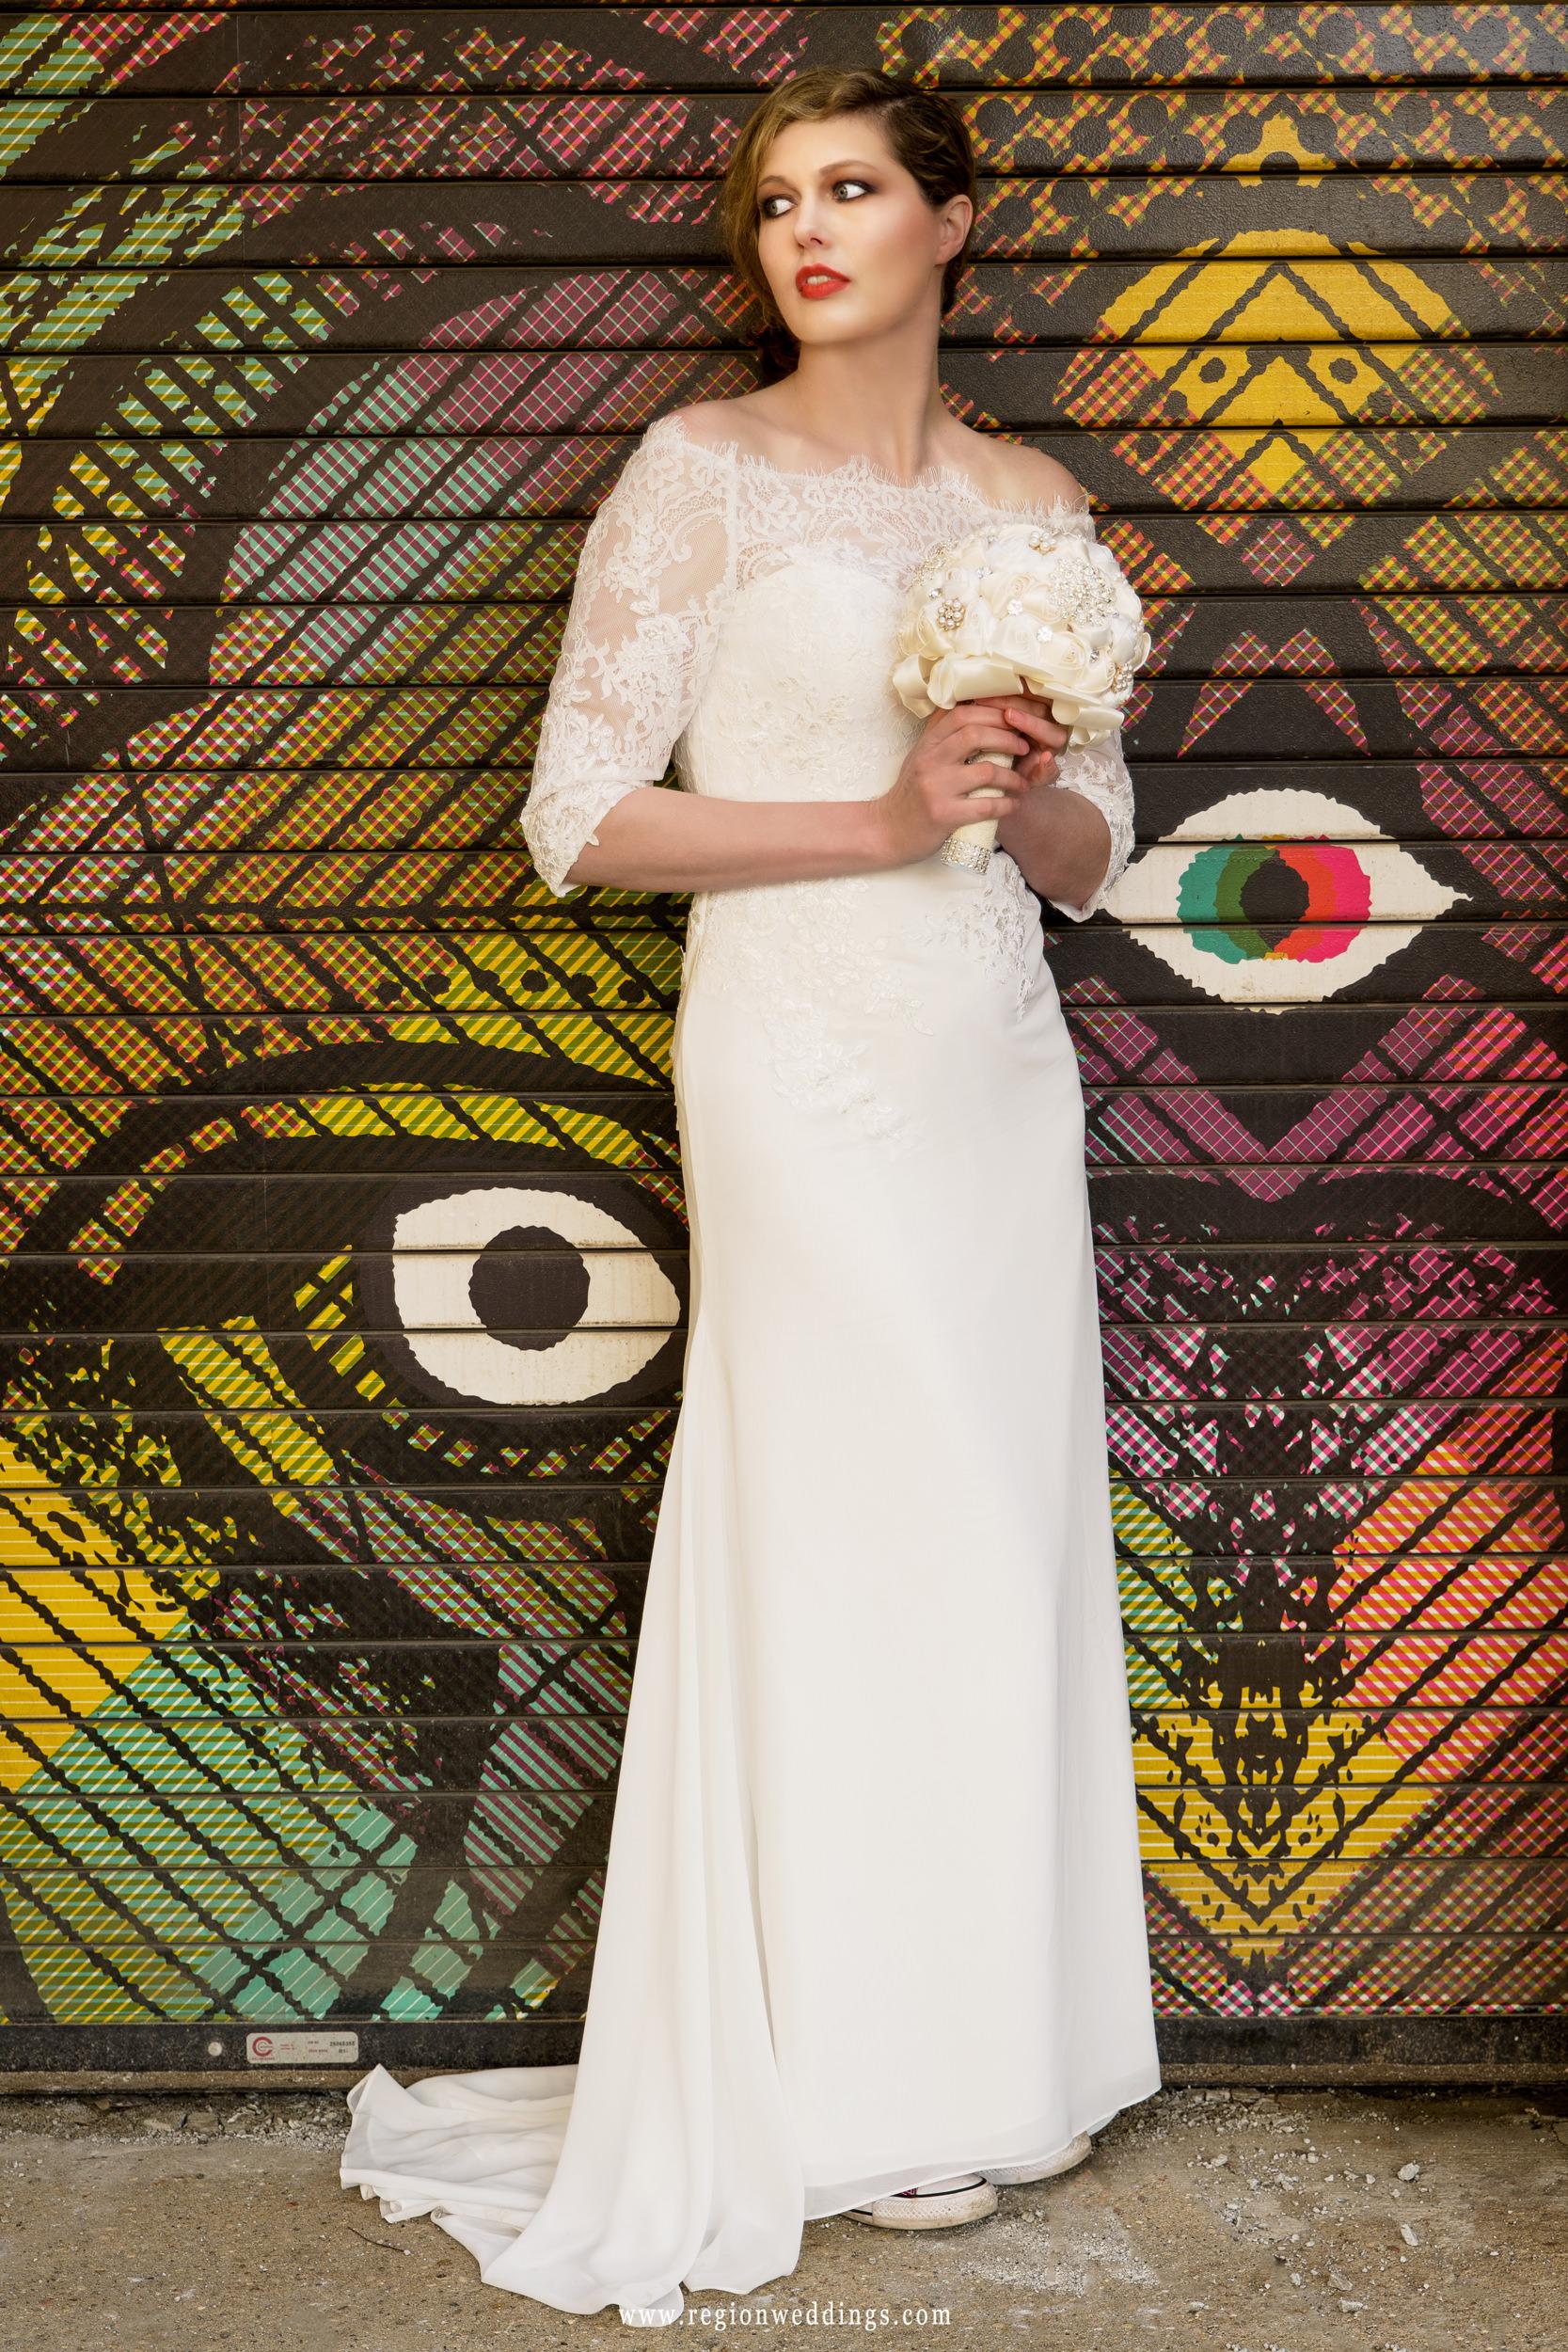 Bridal portrait using a colorful garage door as a backdrop.